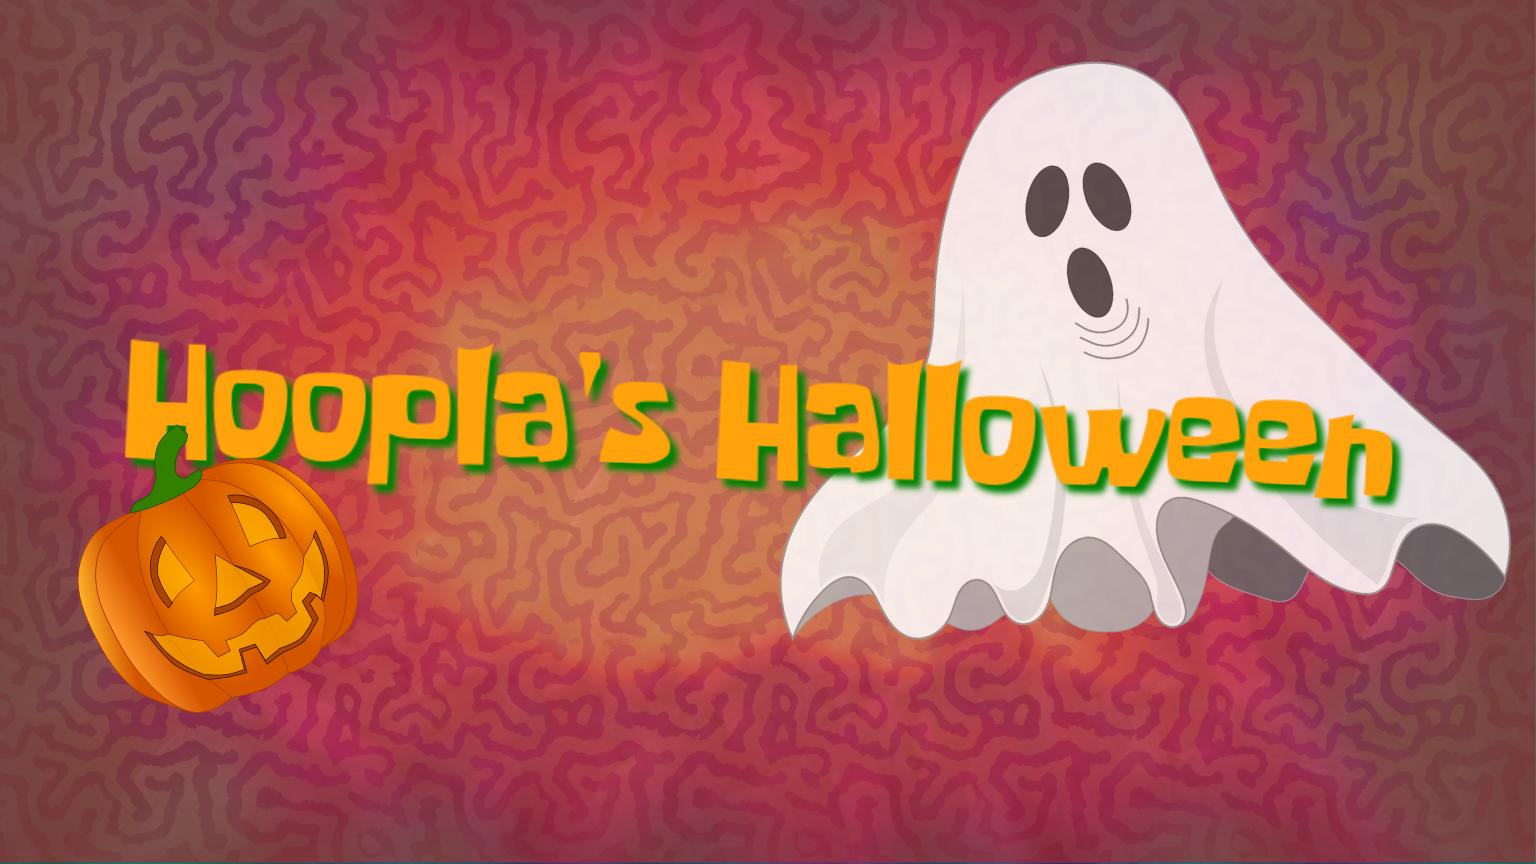 Hoopla's Halloween